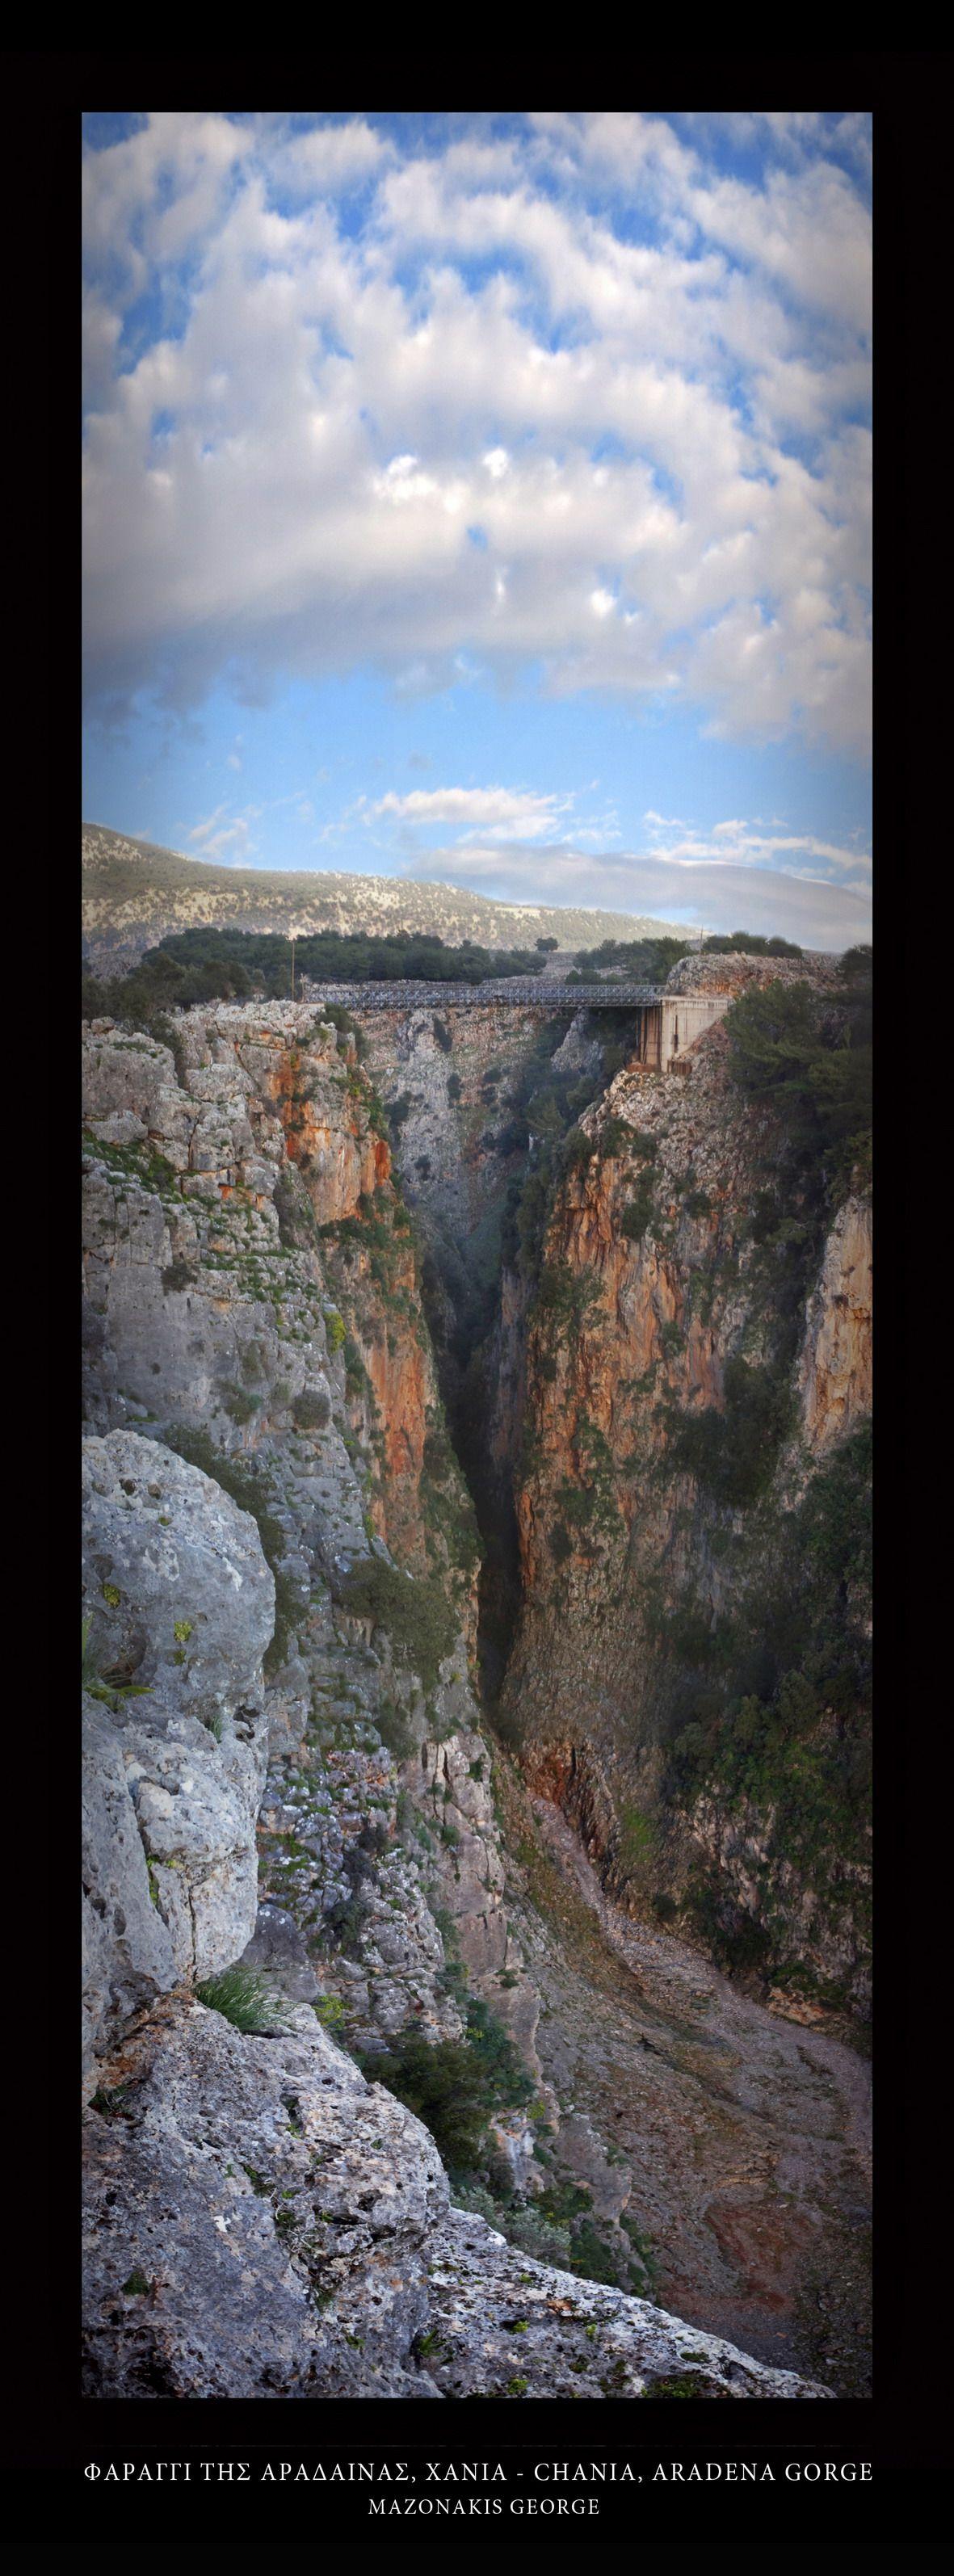 Chania, Aradena gorge